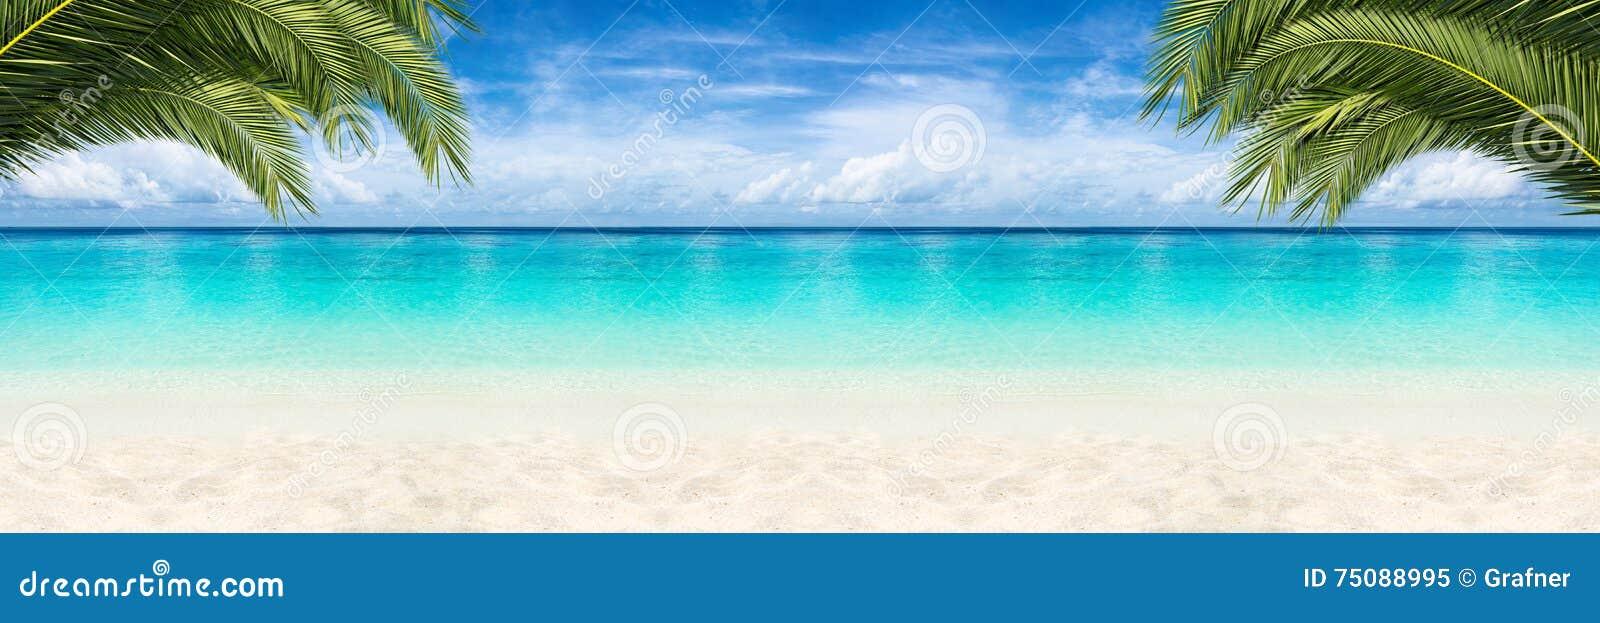 Fond de plage de paradis